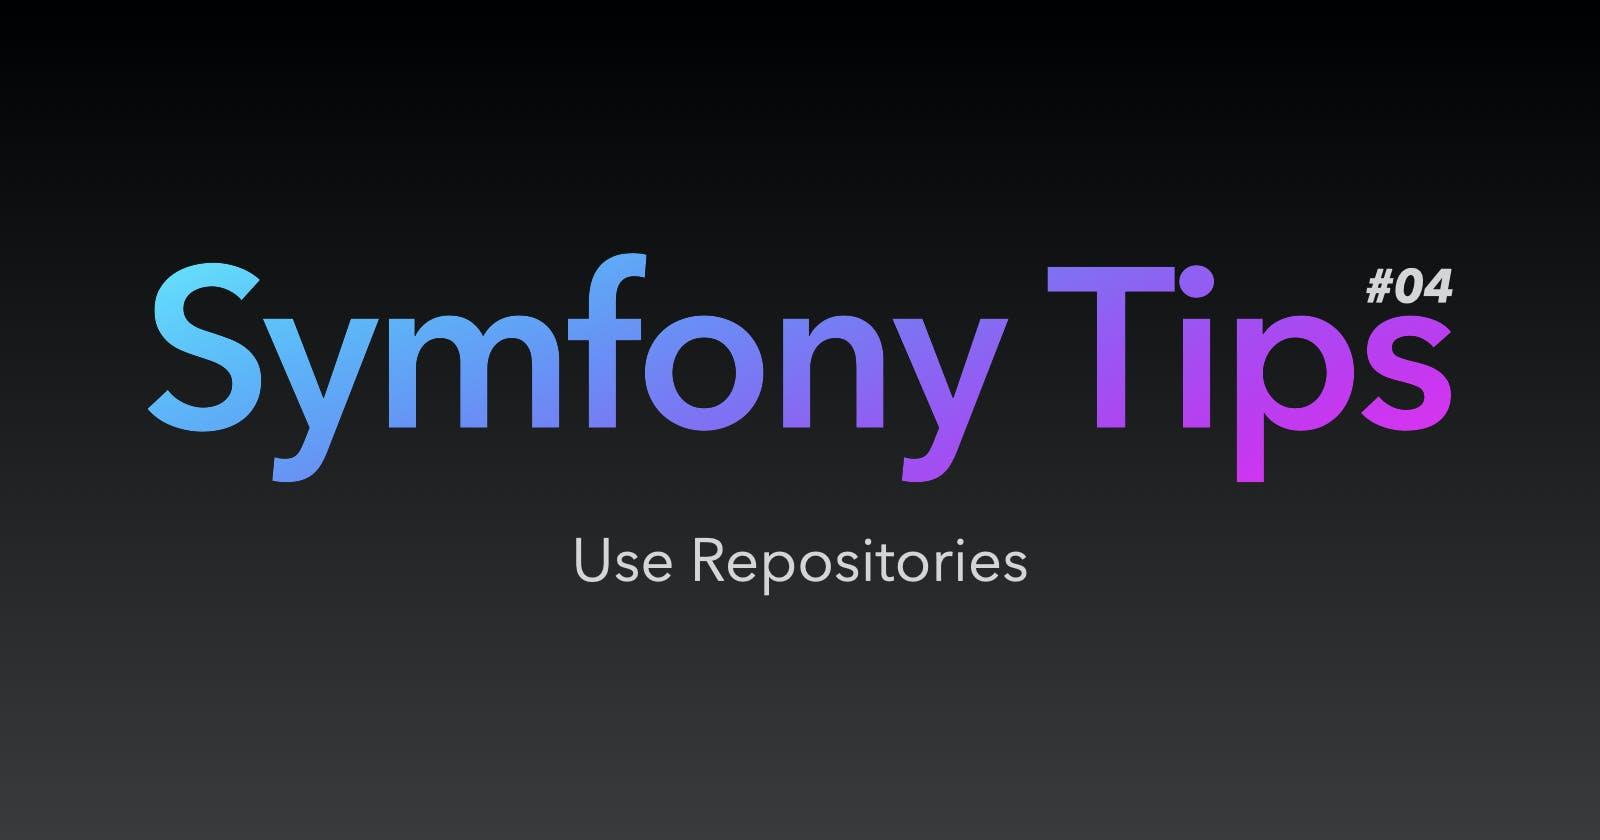 Symfony Tips #04 - Use Repositories